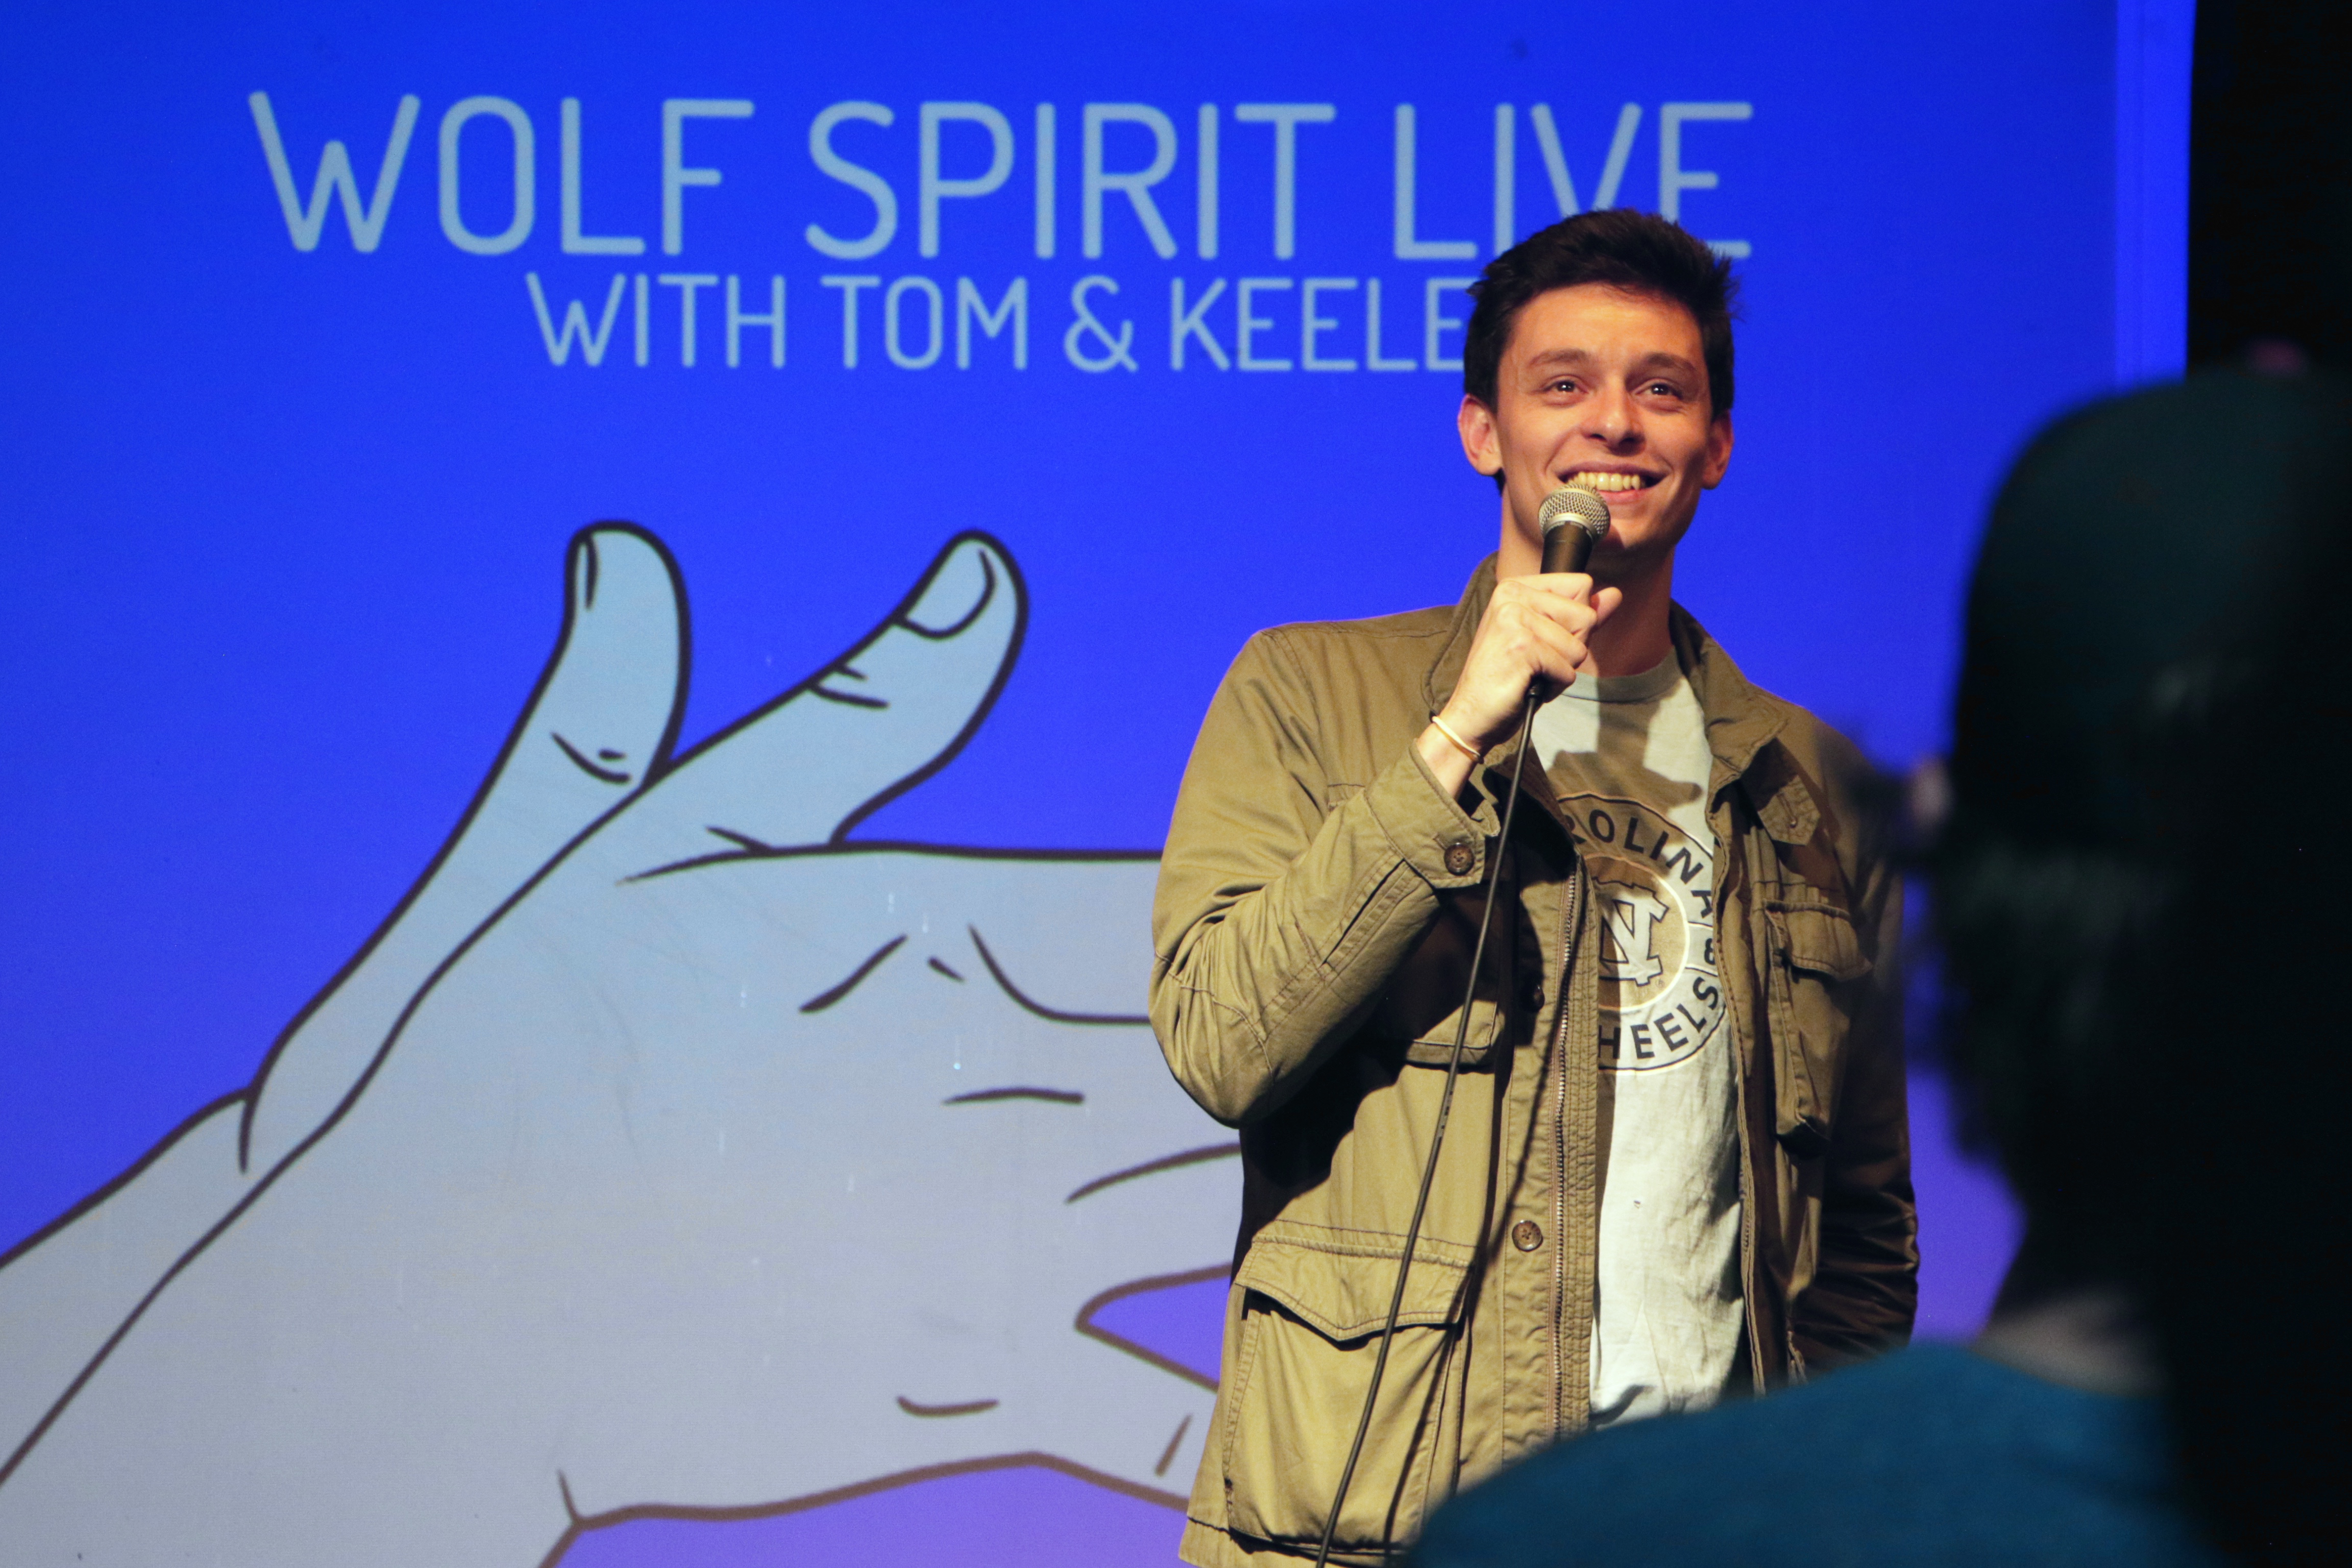 Wolf Spirit Live - Randy Syphax